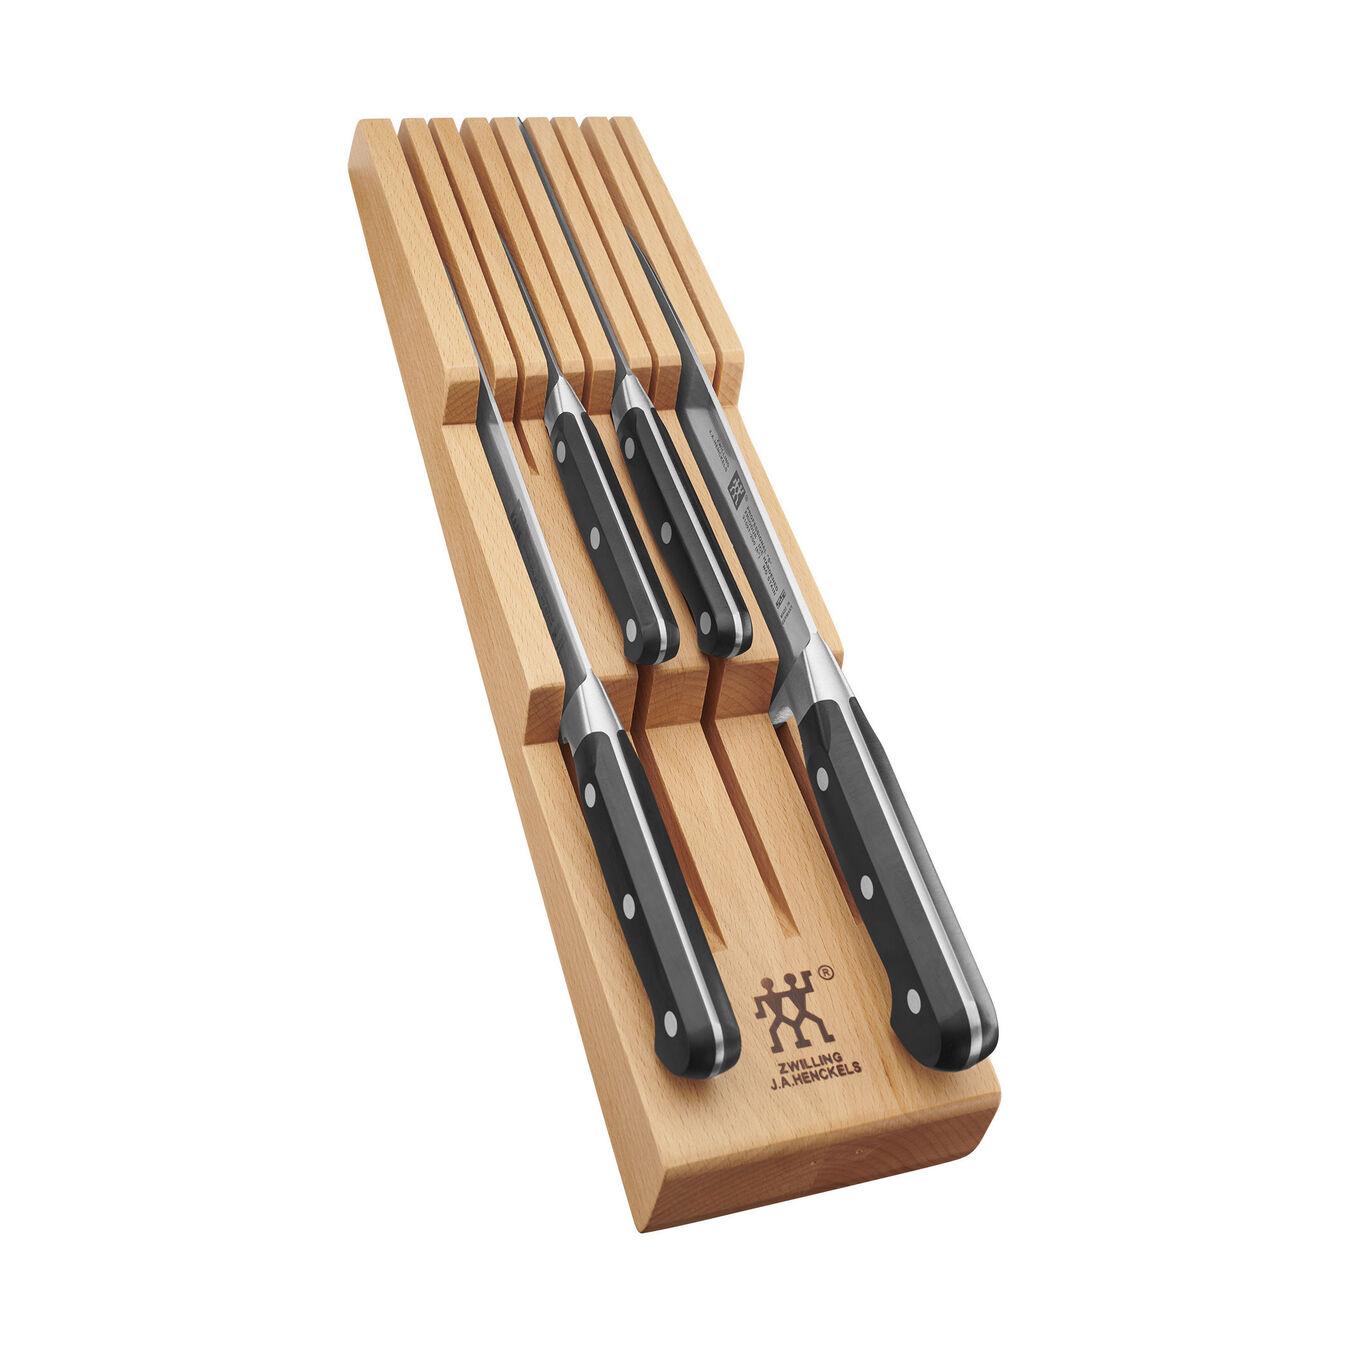 7-pc, Knife block set, Natural,,large 1